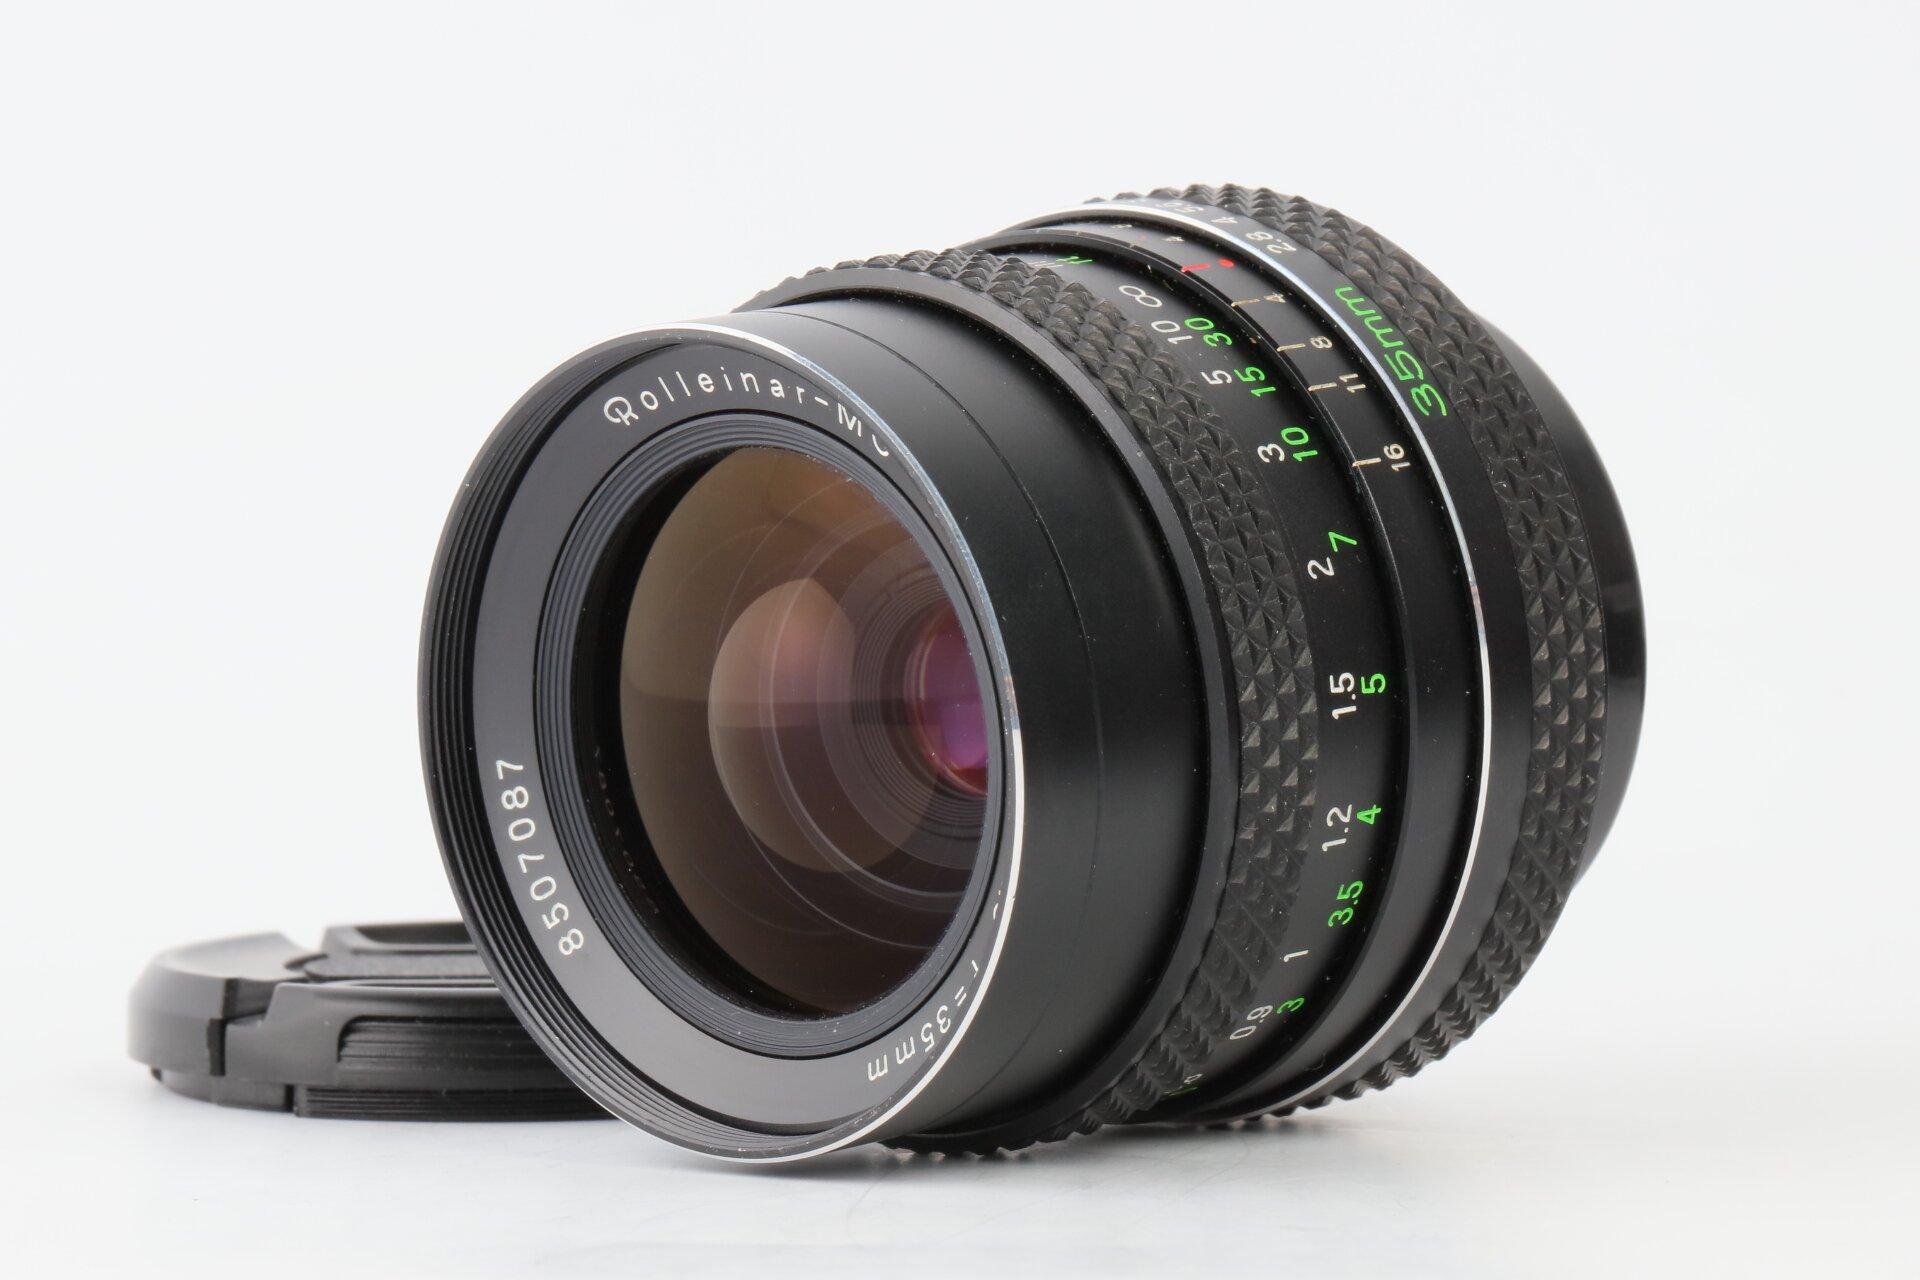 Rollei SLR 35mm 2,8 Rolleinar-MC